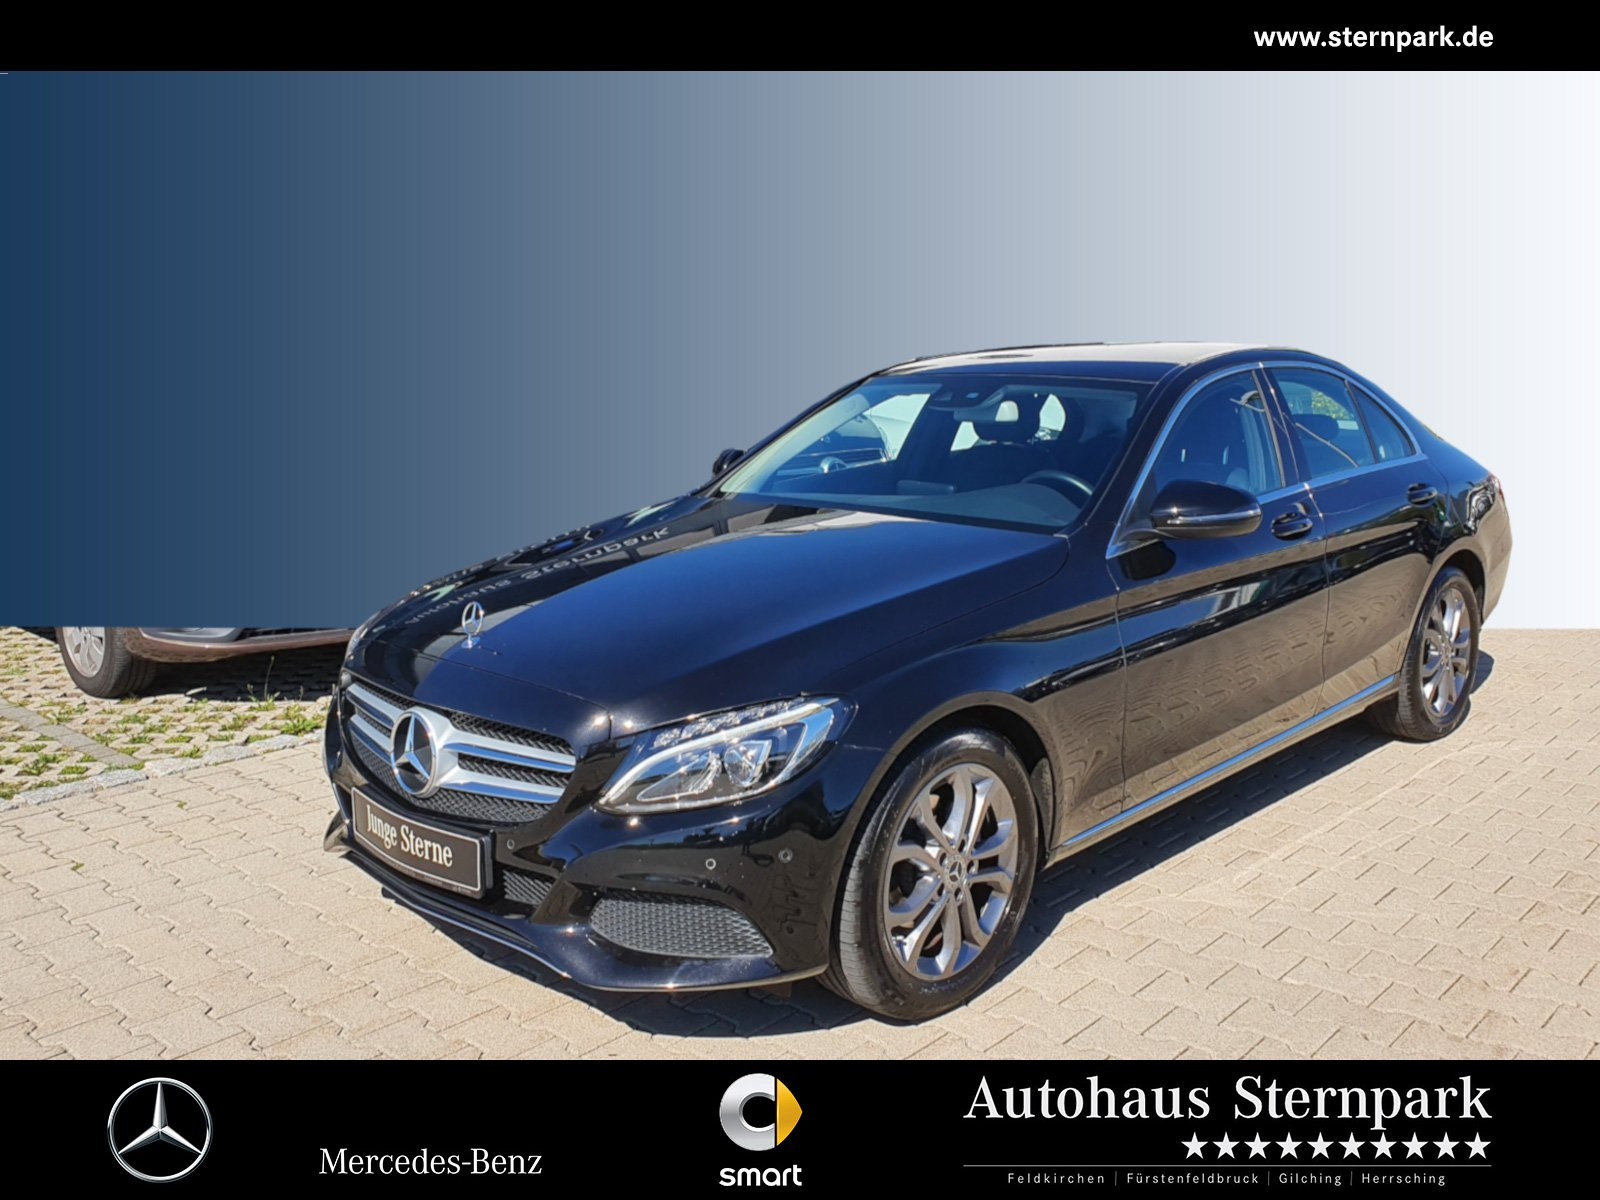 Mercedes-Benz C 180 Avantgarde LED/Navi/Spur-Paket/PTS u.v.m, Jahr 2018, Benzin